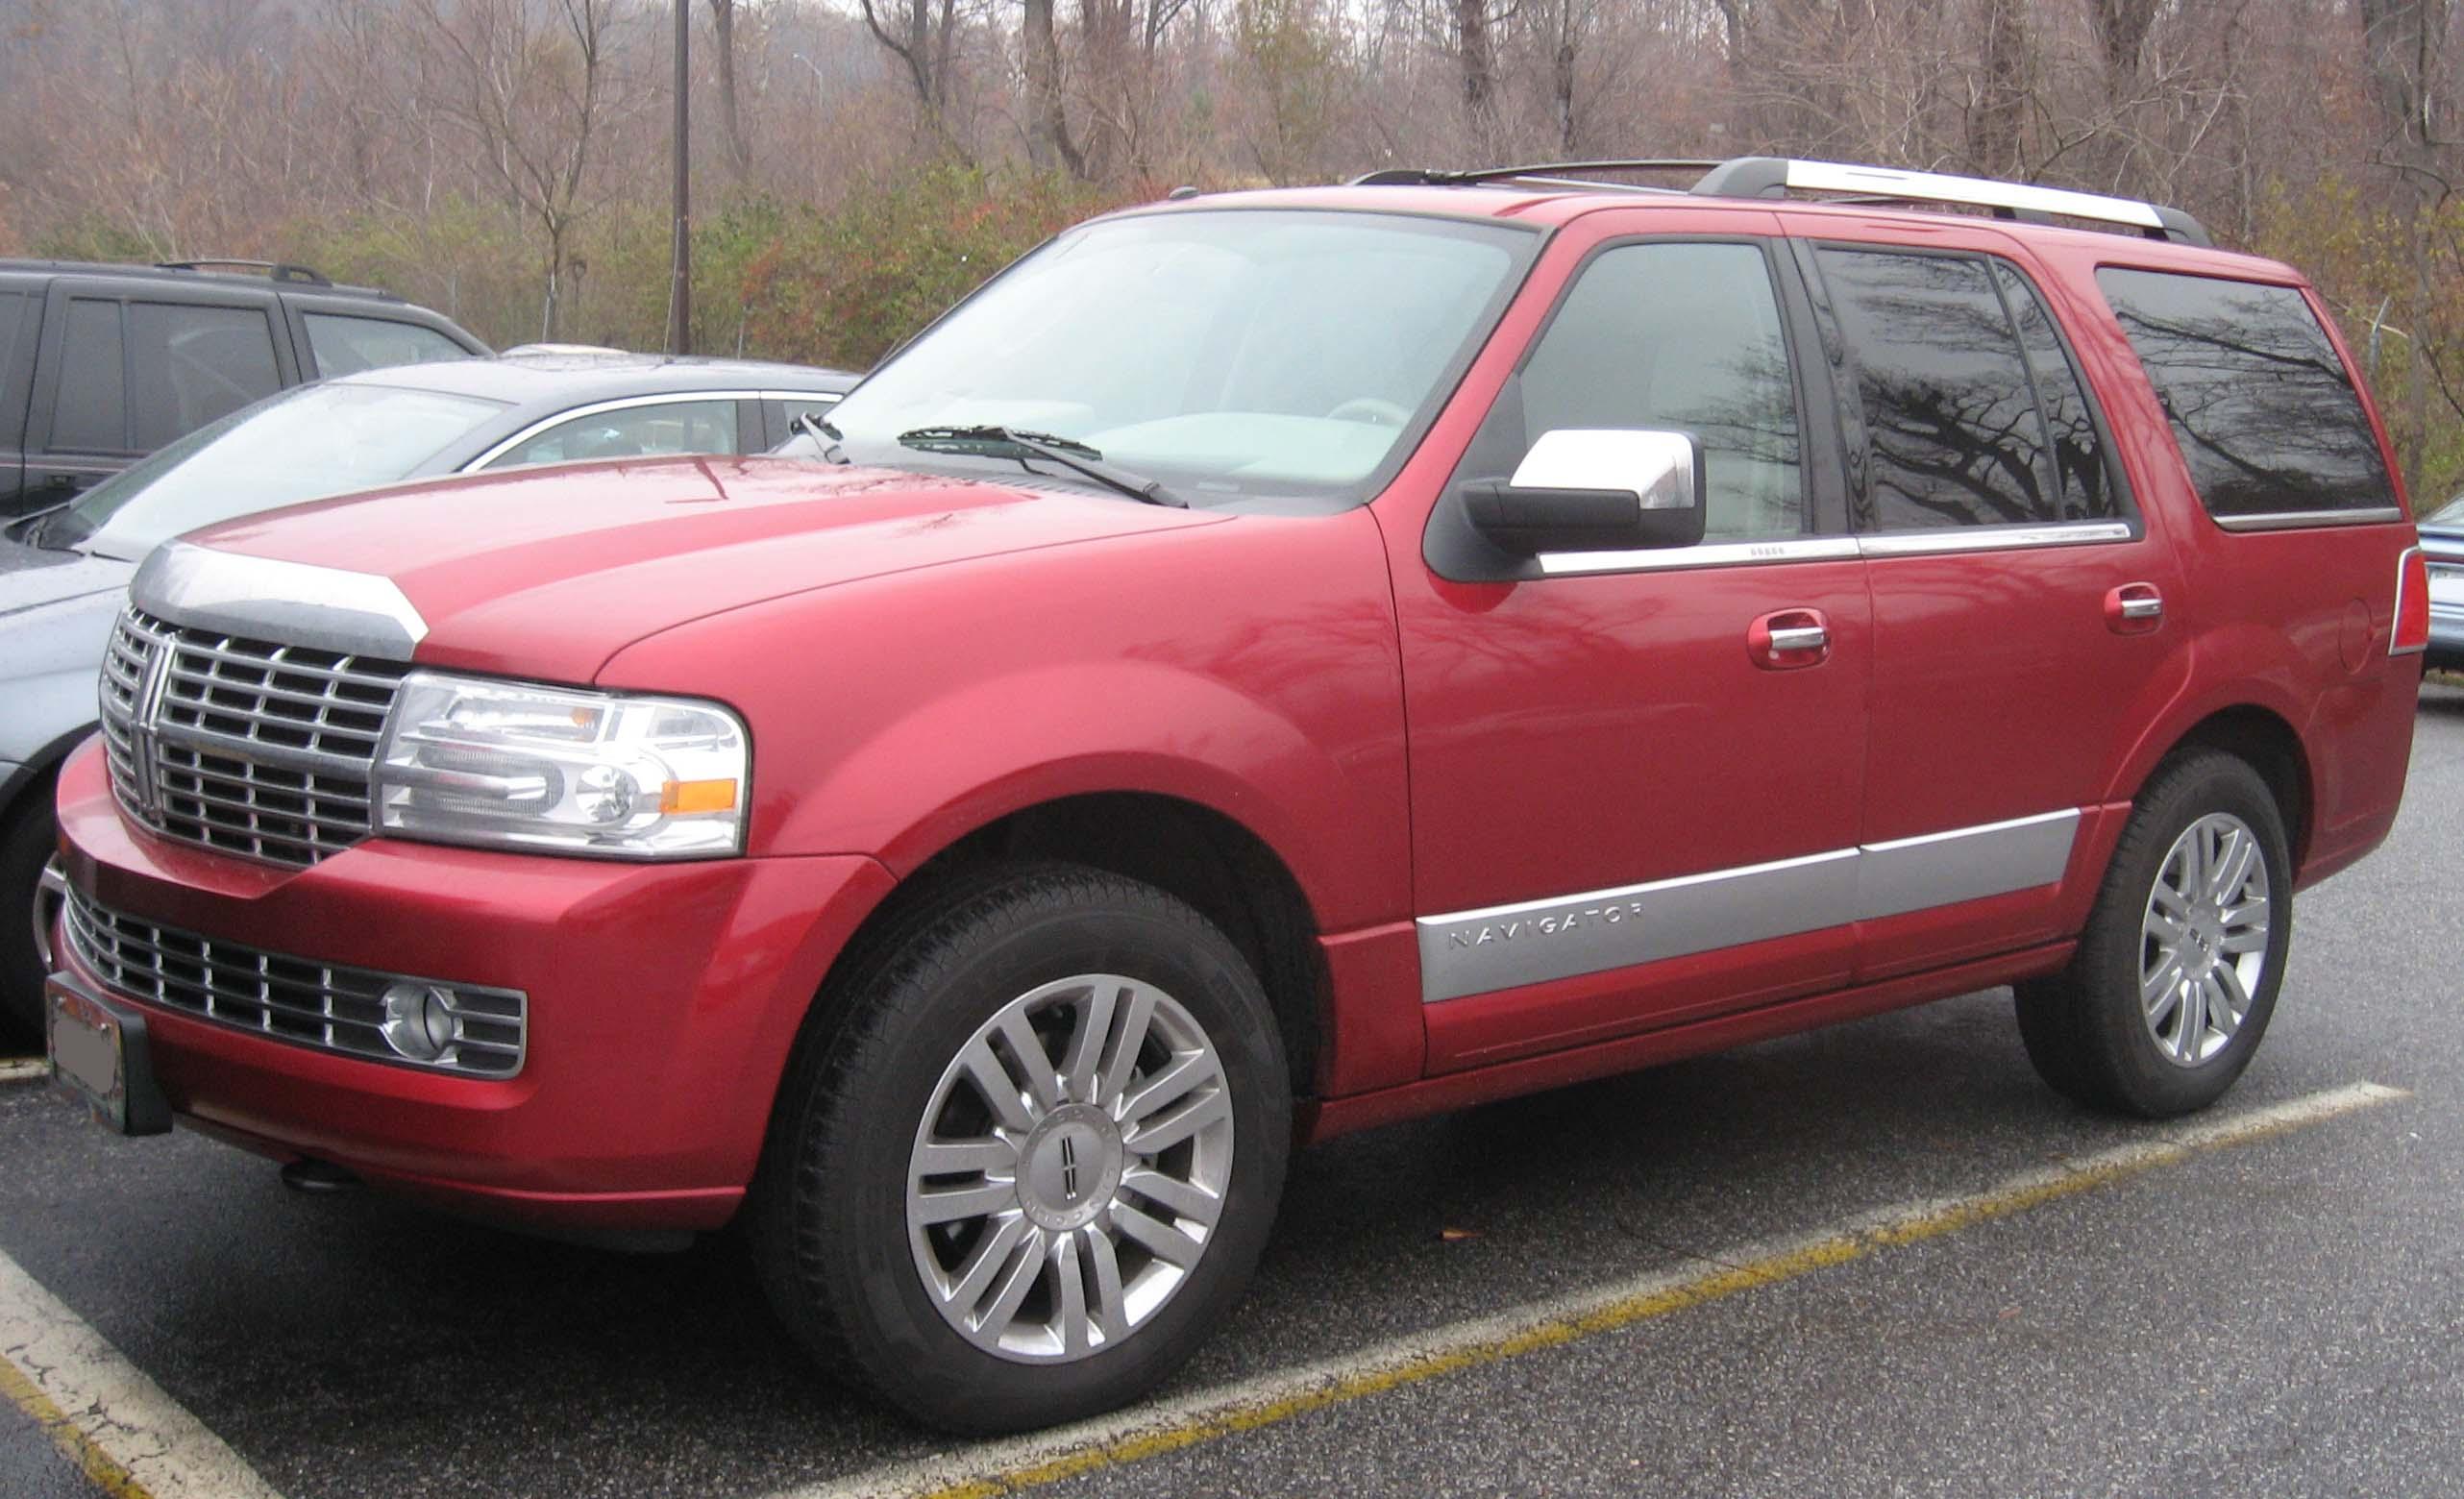 trucks s navigator cars photos pictures u report news lincoln dashboard world interior